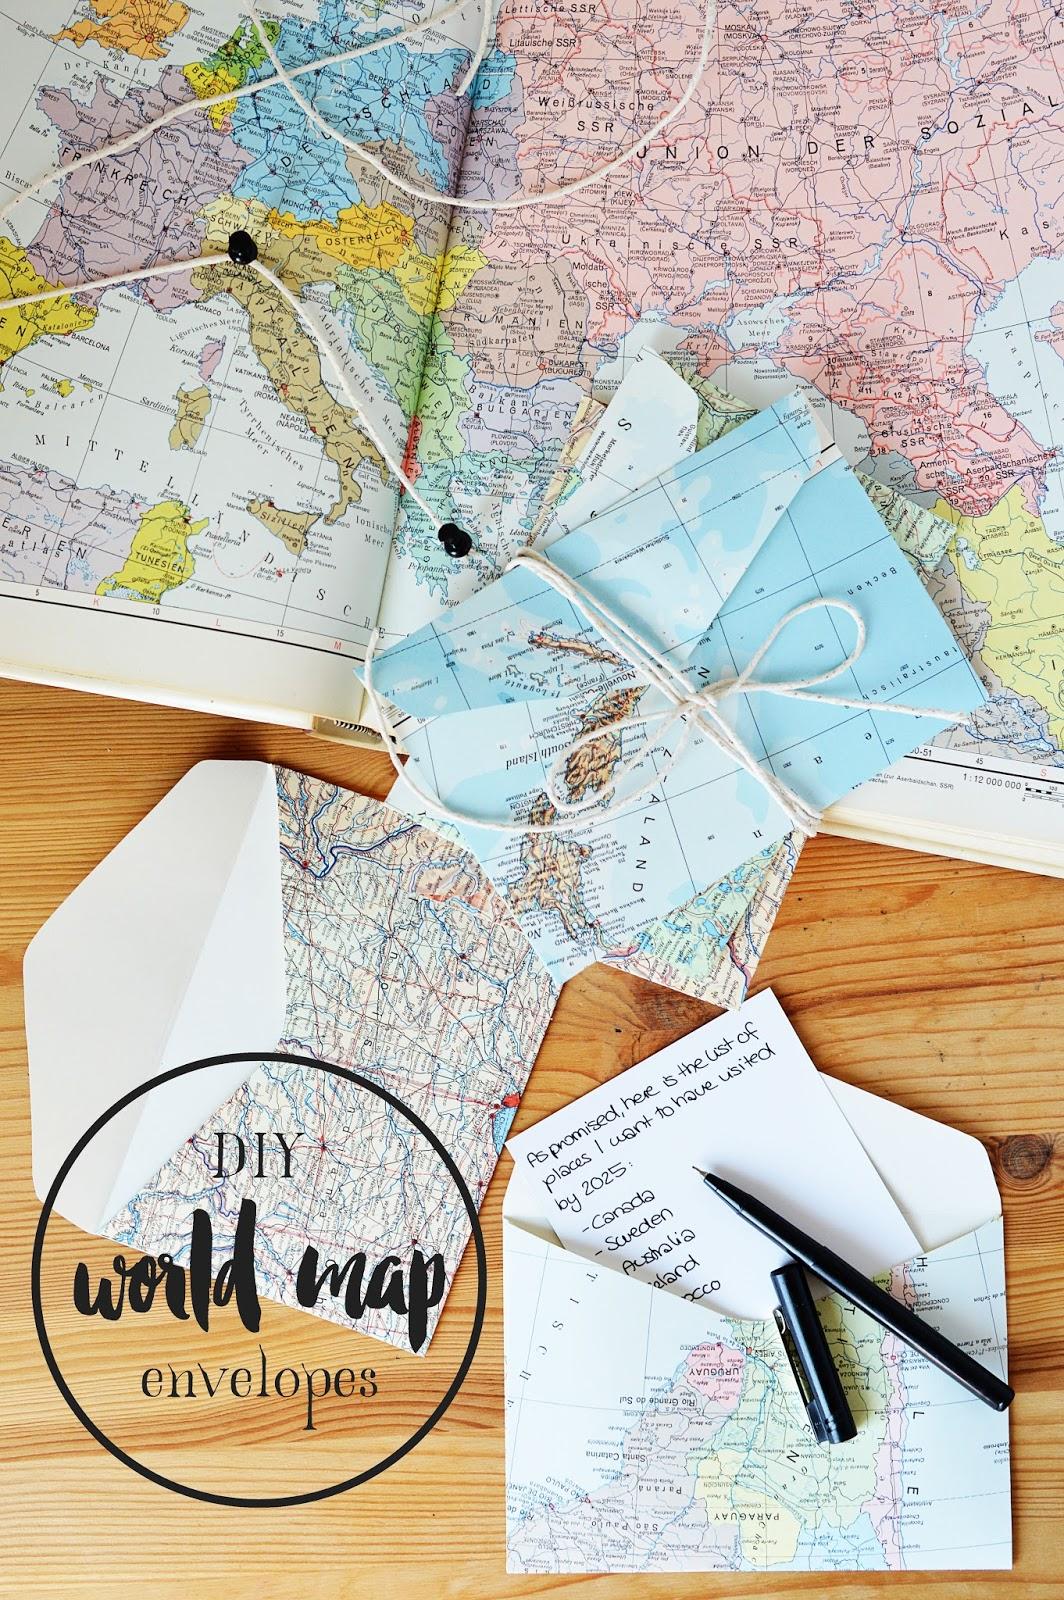 DIY World Map Envelopes | Motte's Blog | Free Template